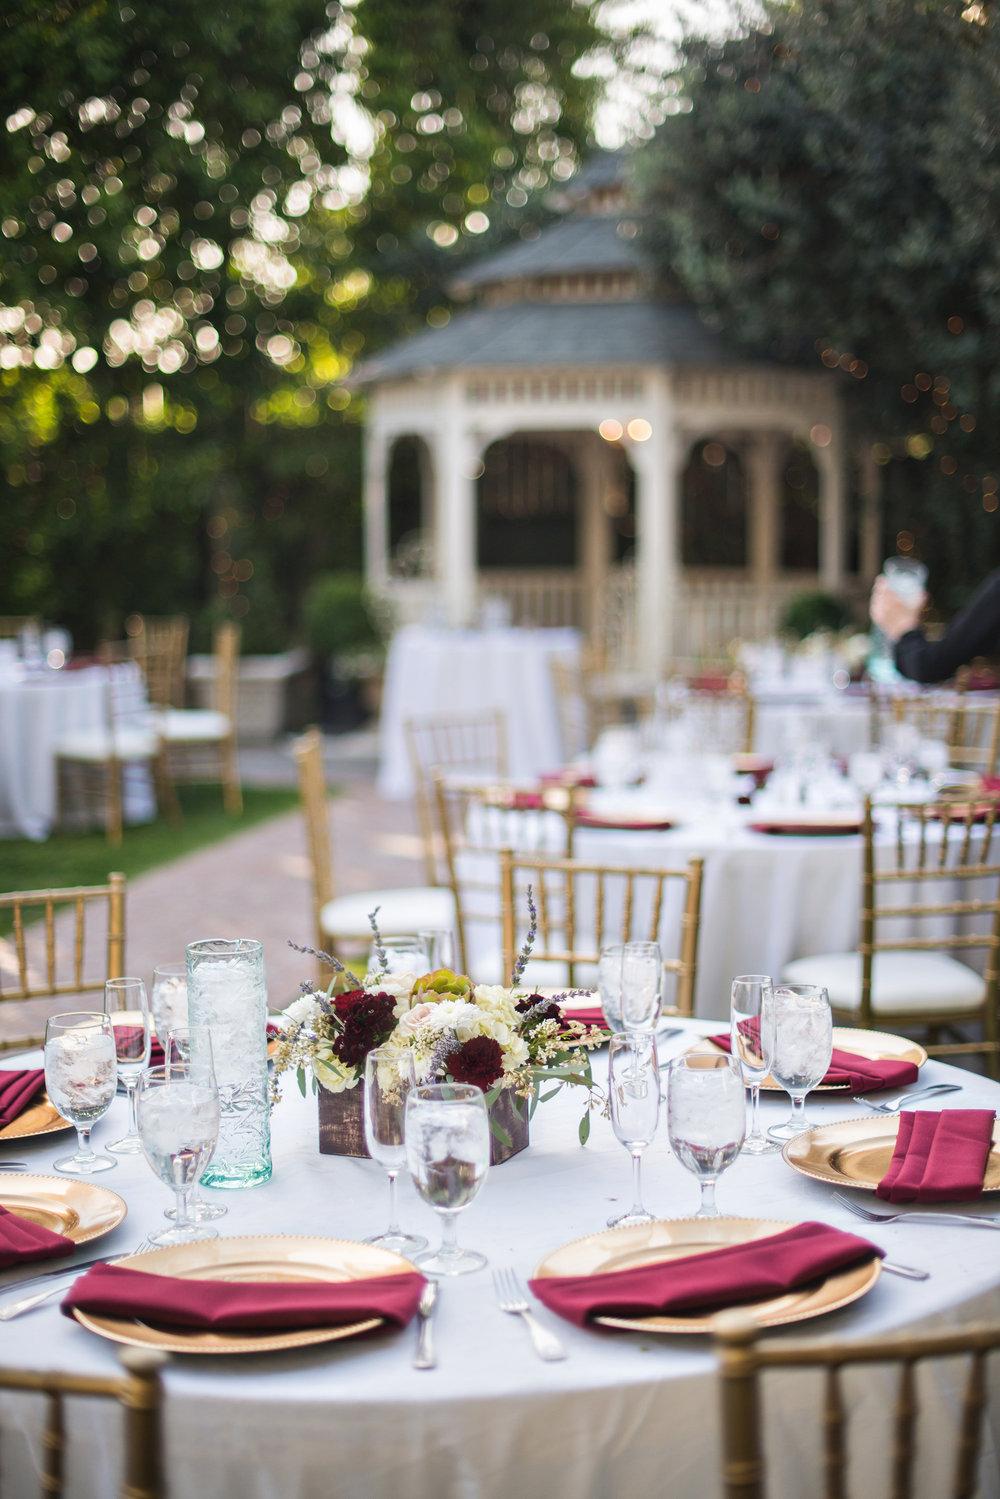 glamorous-jewel-tones-christmas-house-wedding-carrie-vines-034.jpg